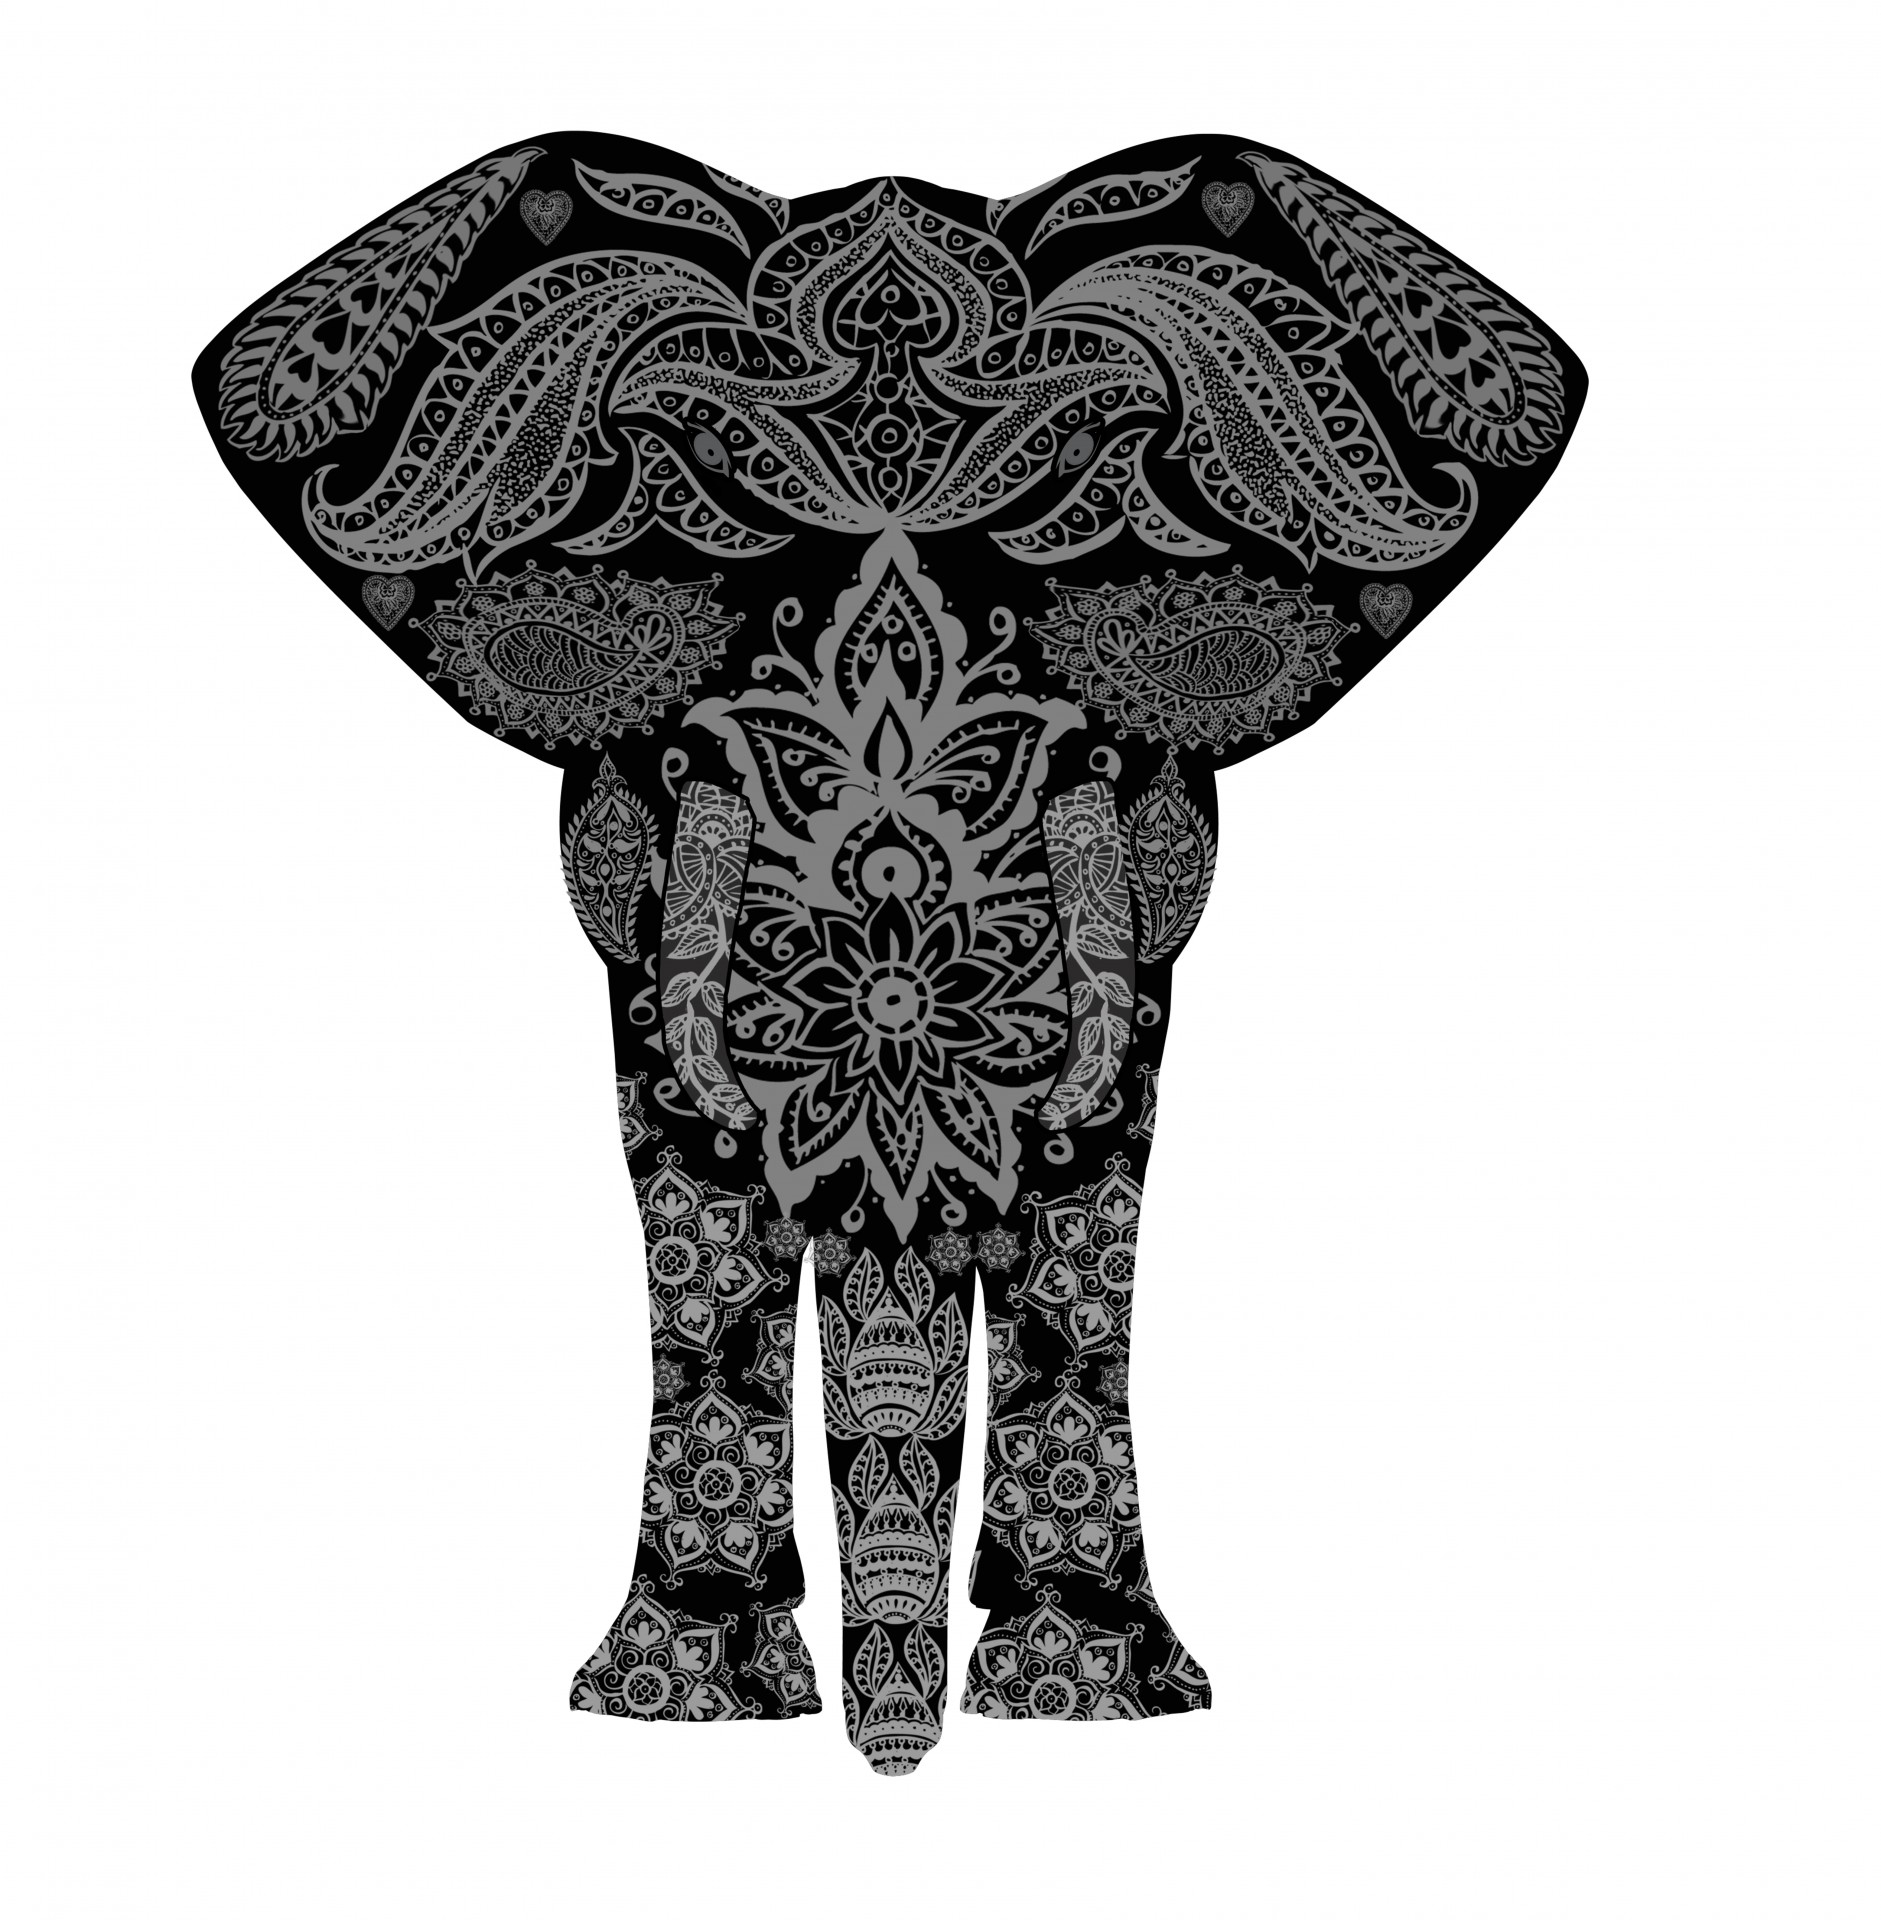 1881x1920 elephant henna mehndi pattern, mehndi, henna, pattern, animal